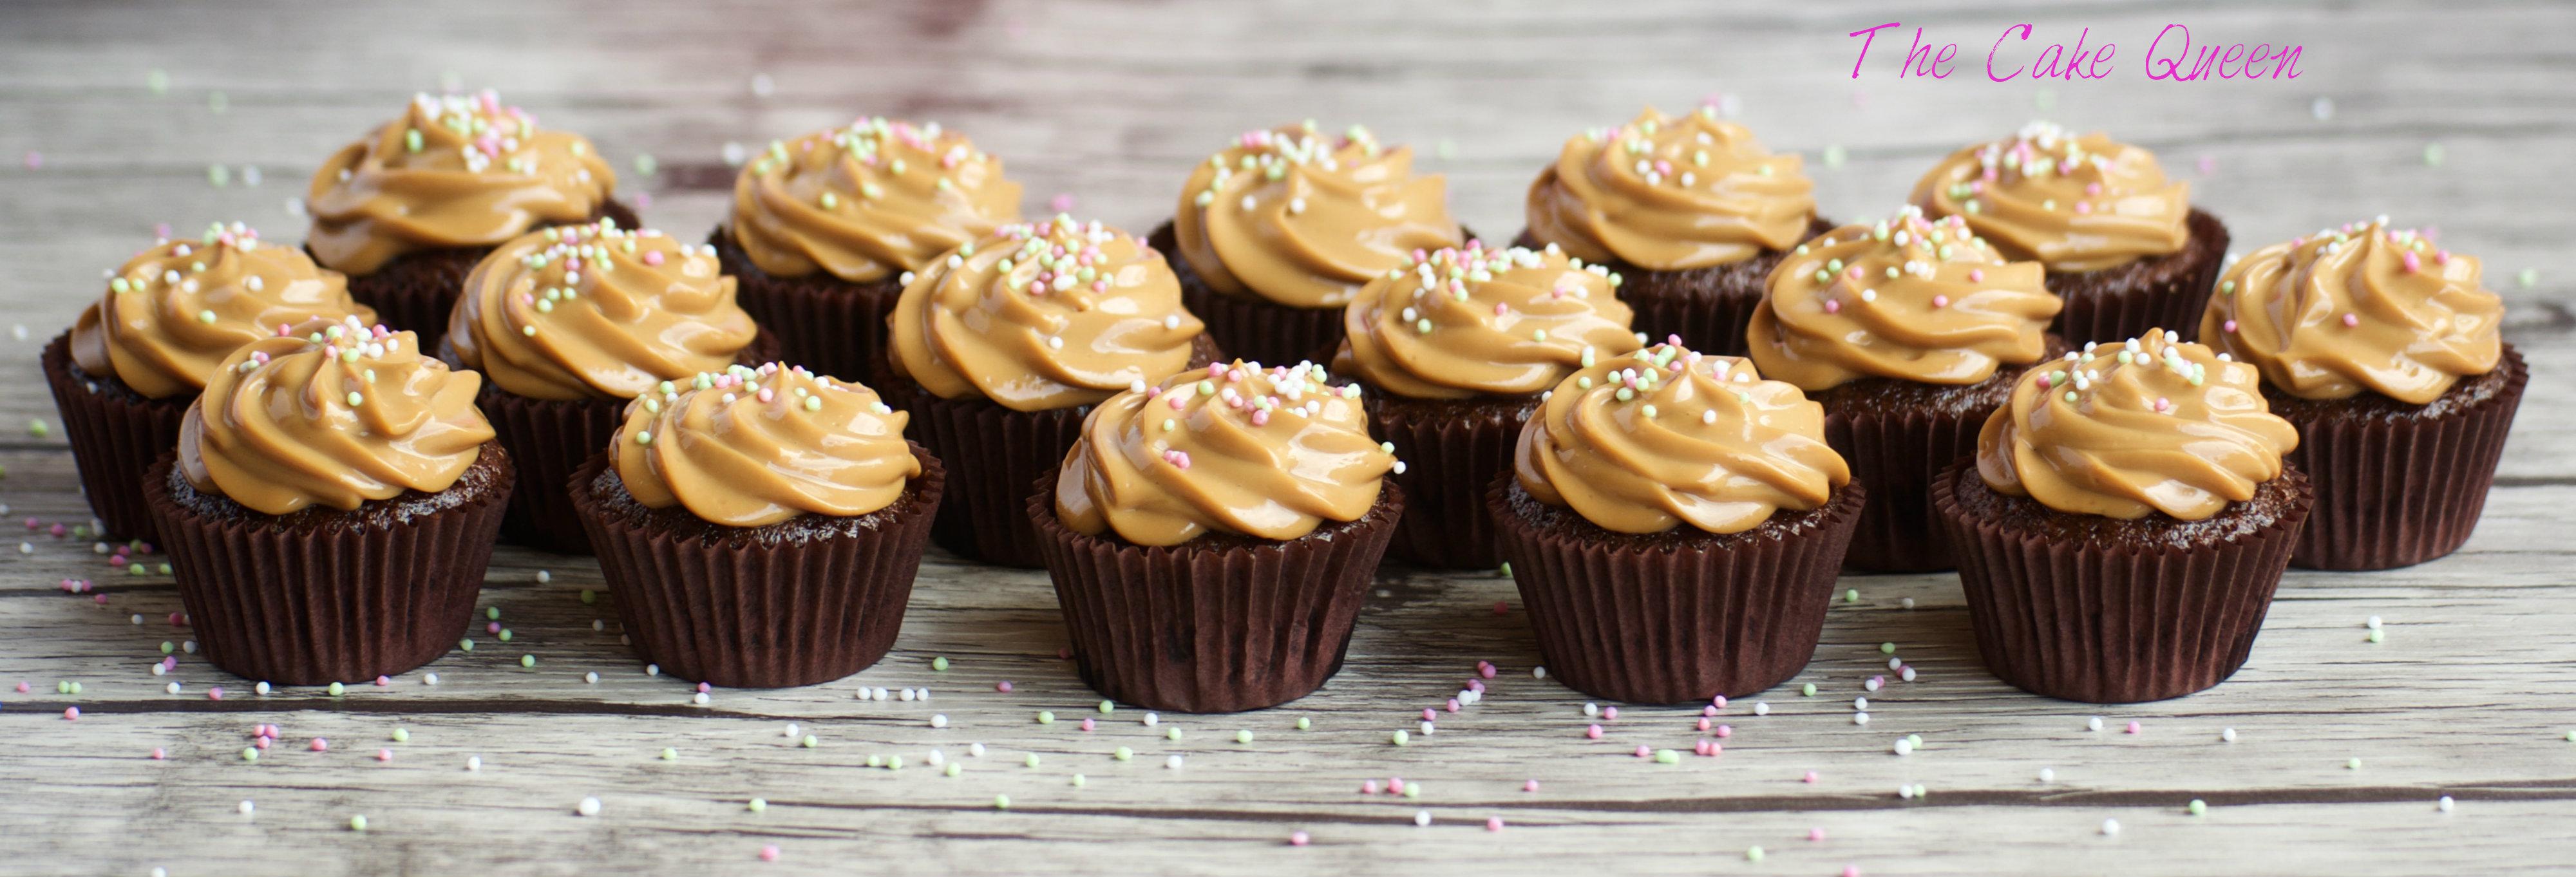 Mini Cupcakes de chocolate con crema de dulce de leche